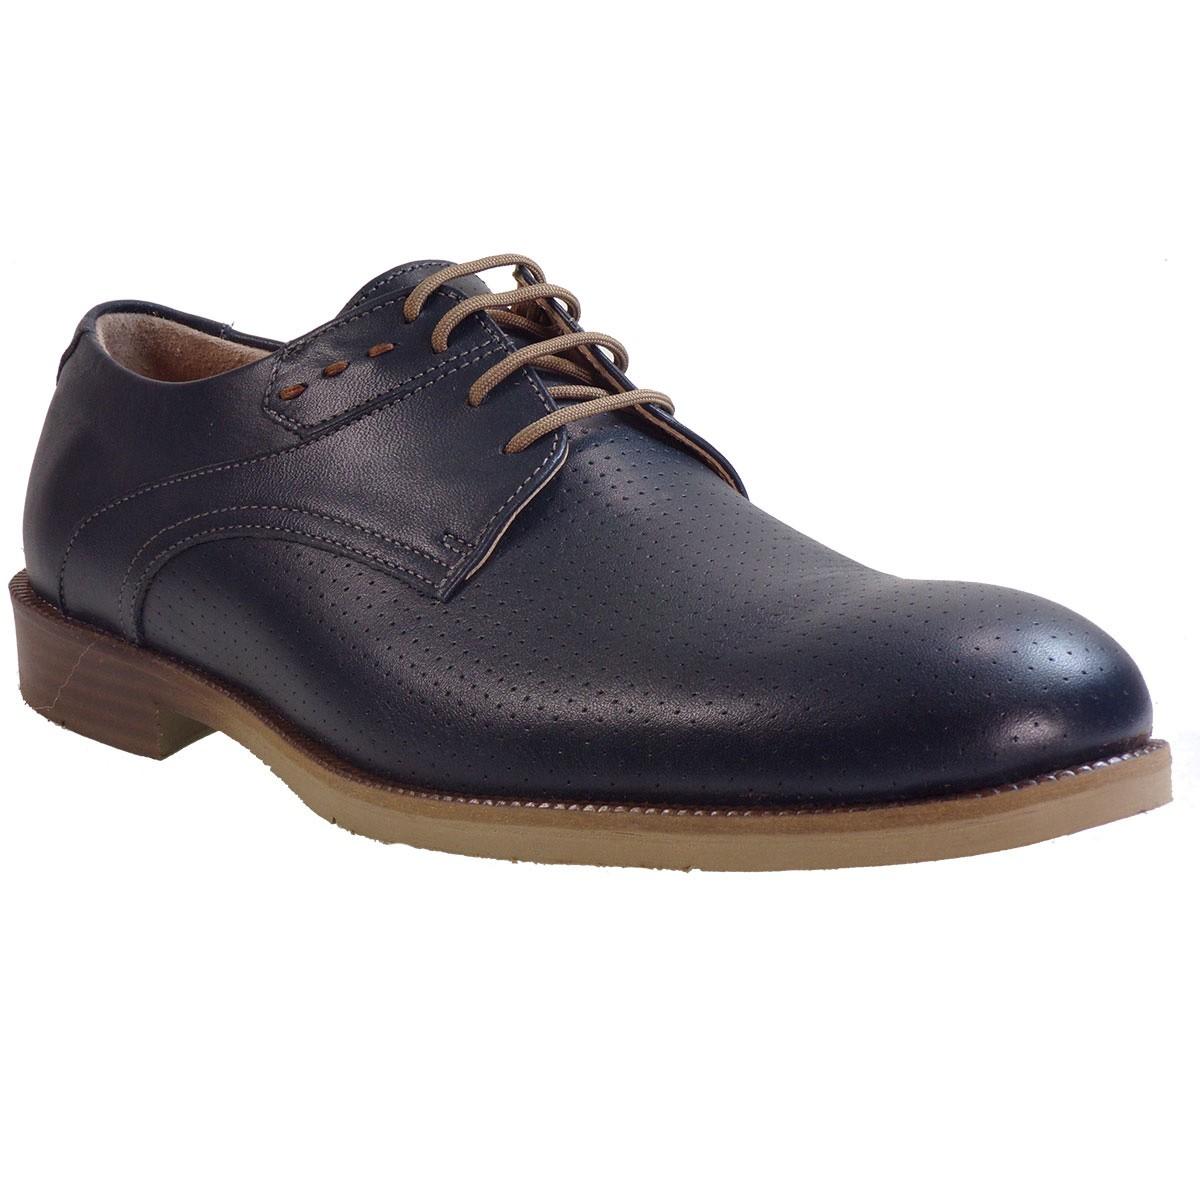 Commanchero Ανδρικά Παπούτσια 91694 Μπλέ Δέρμα